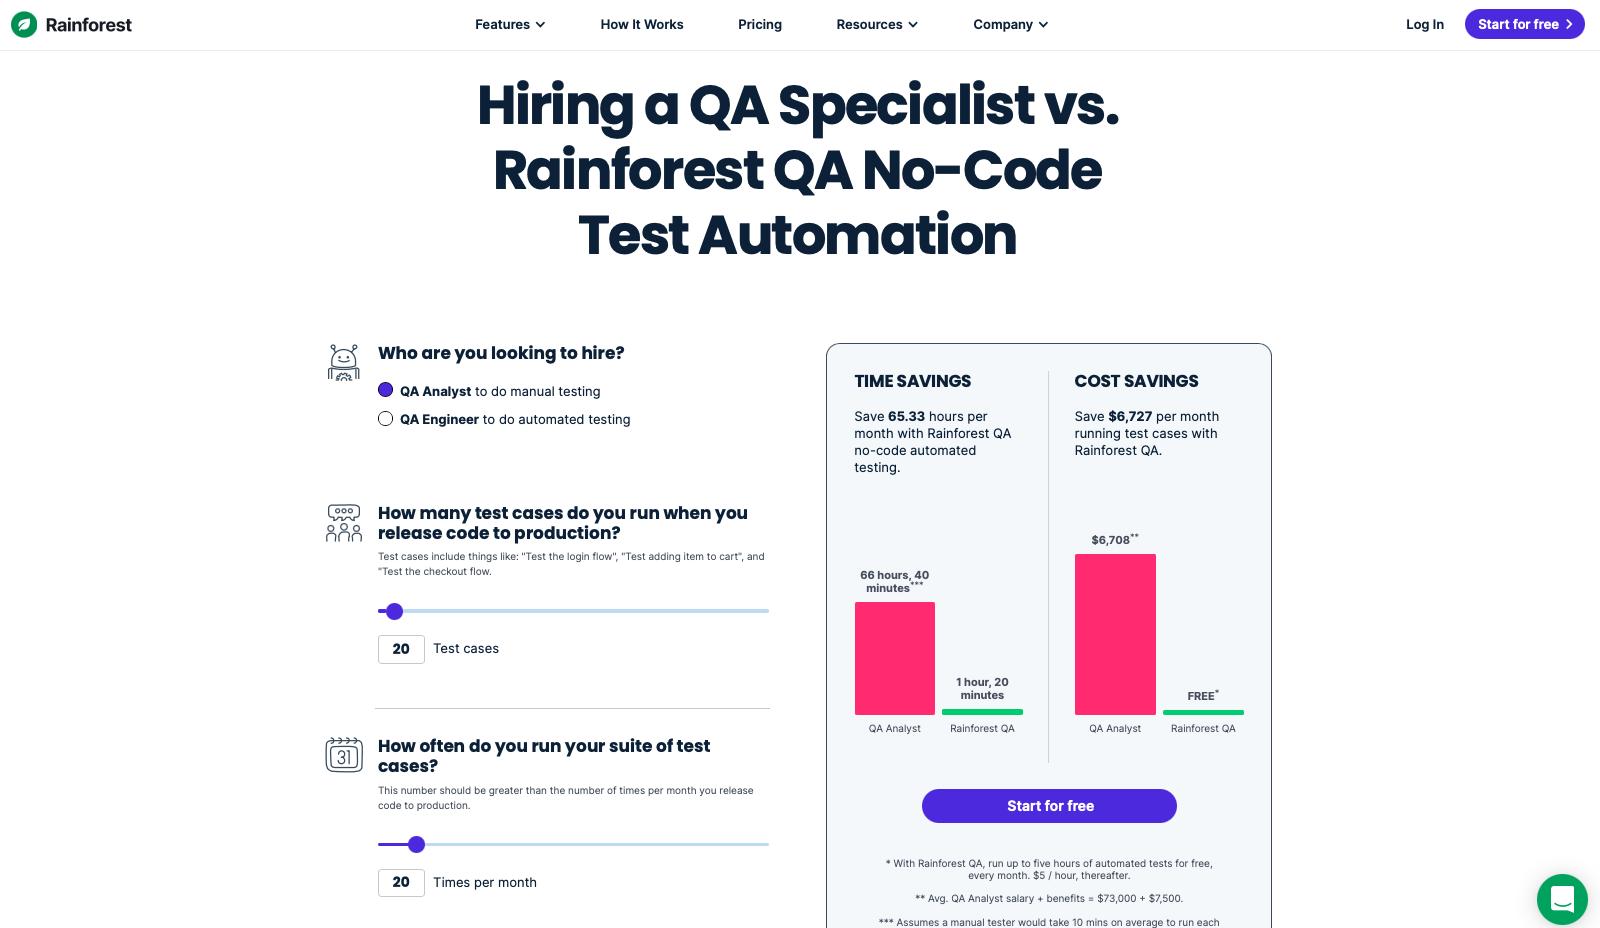 Rainforest QA's savings calculator